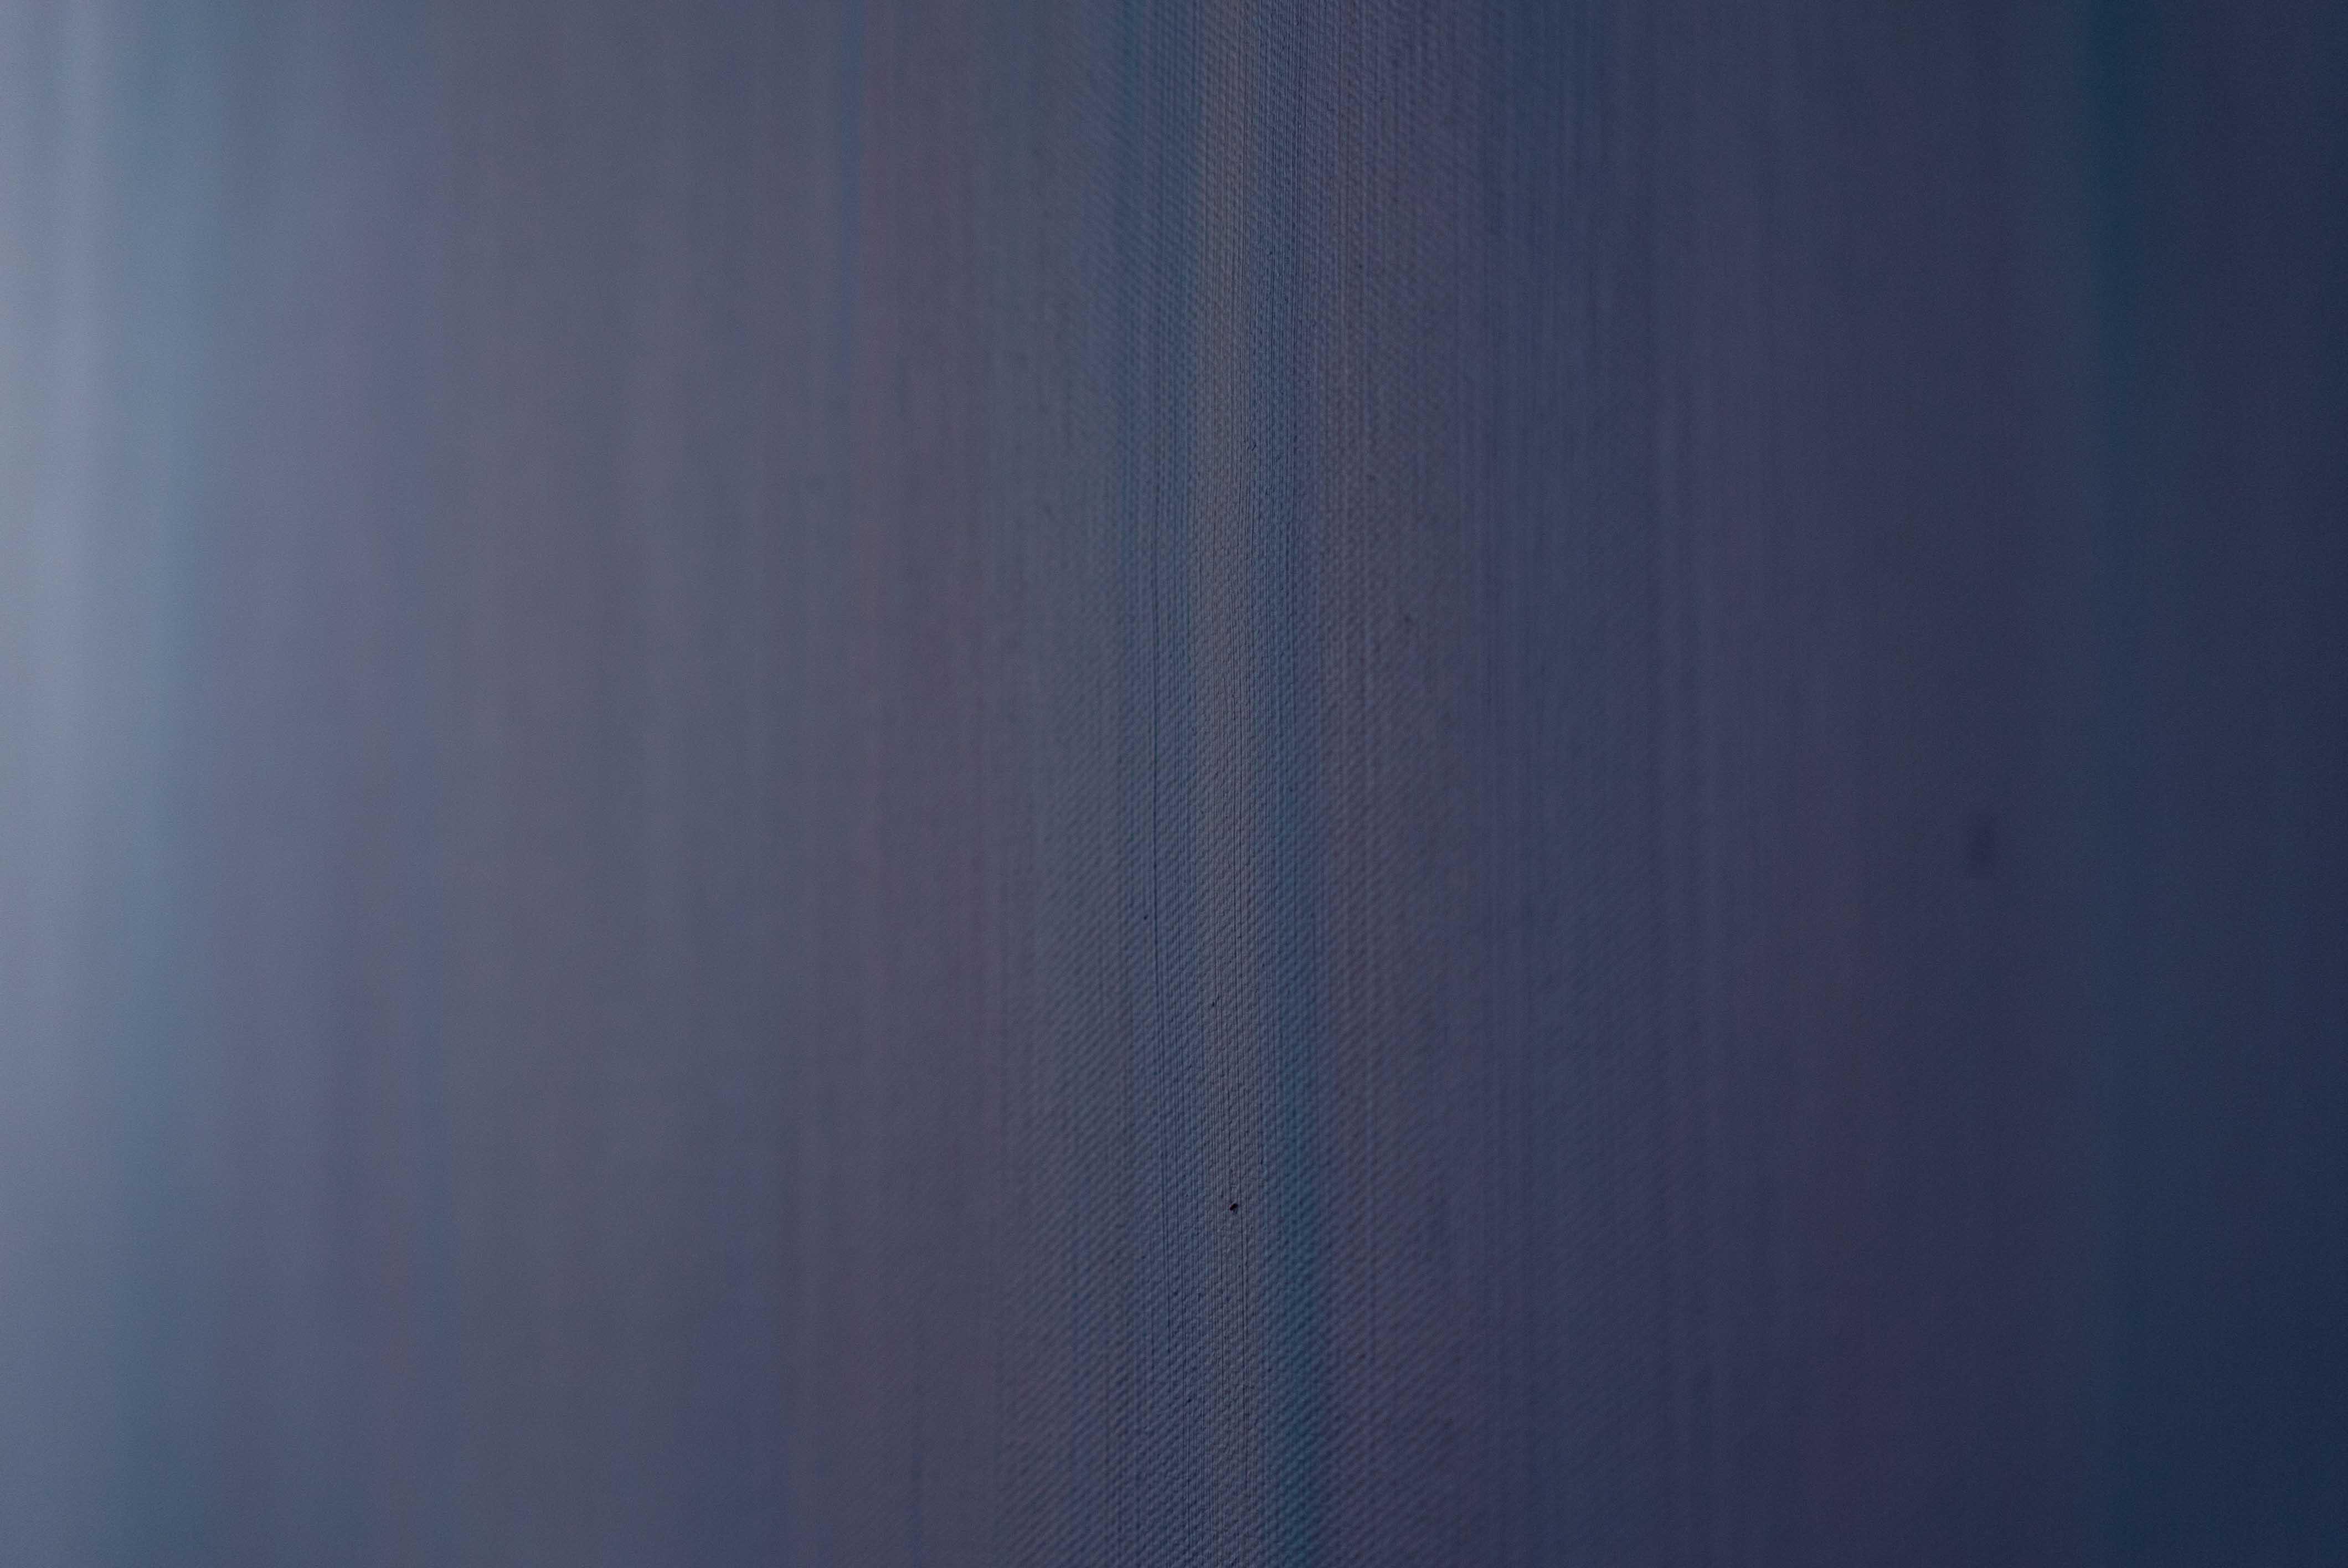 britta-kramer-891-2